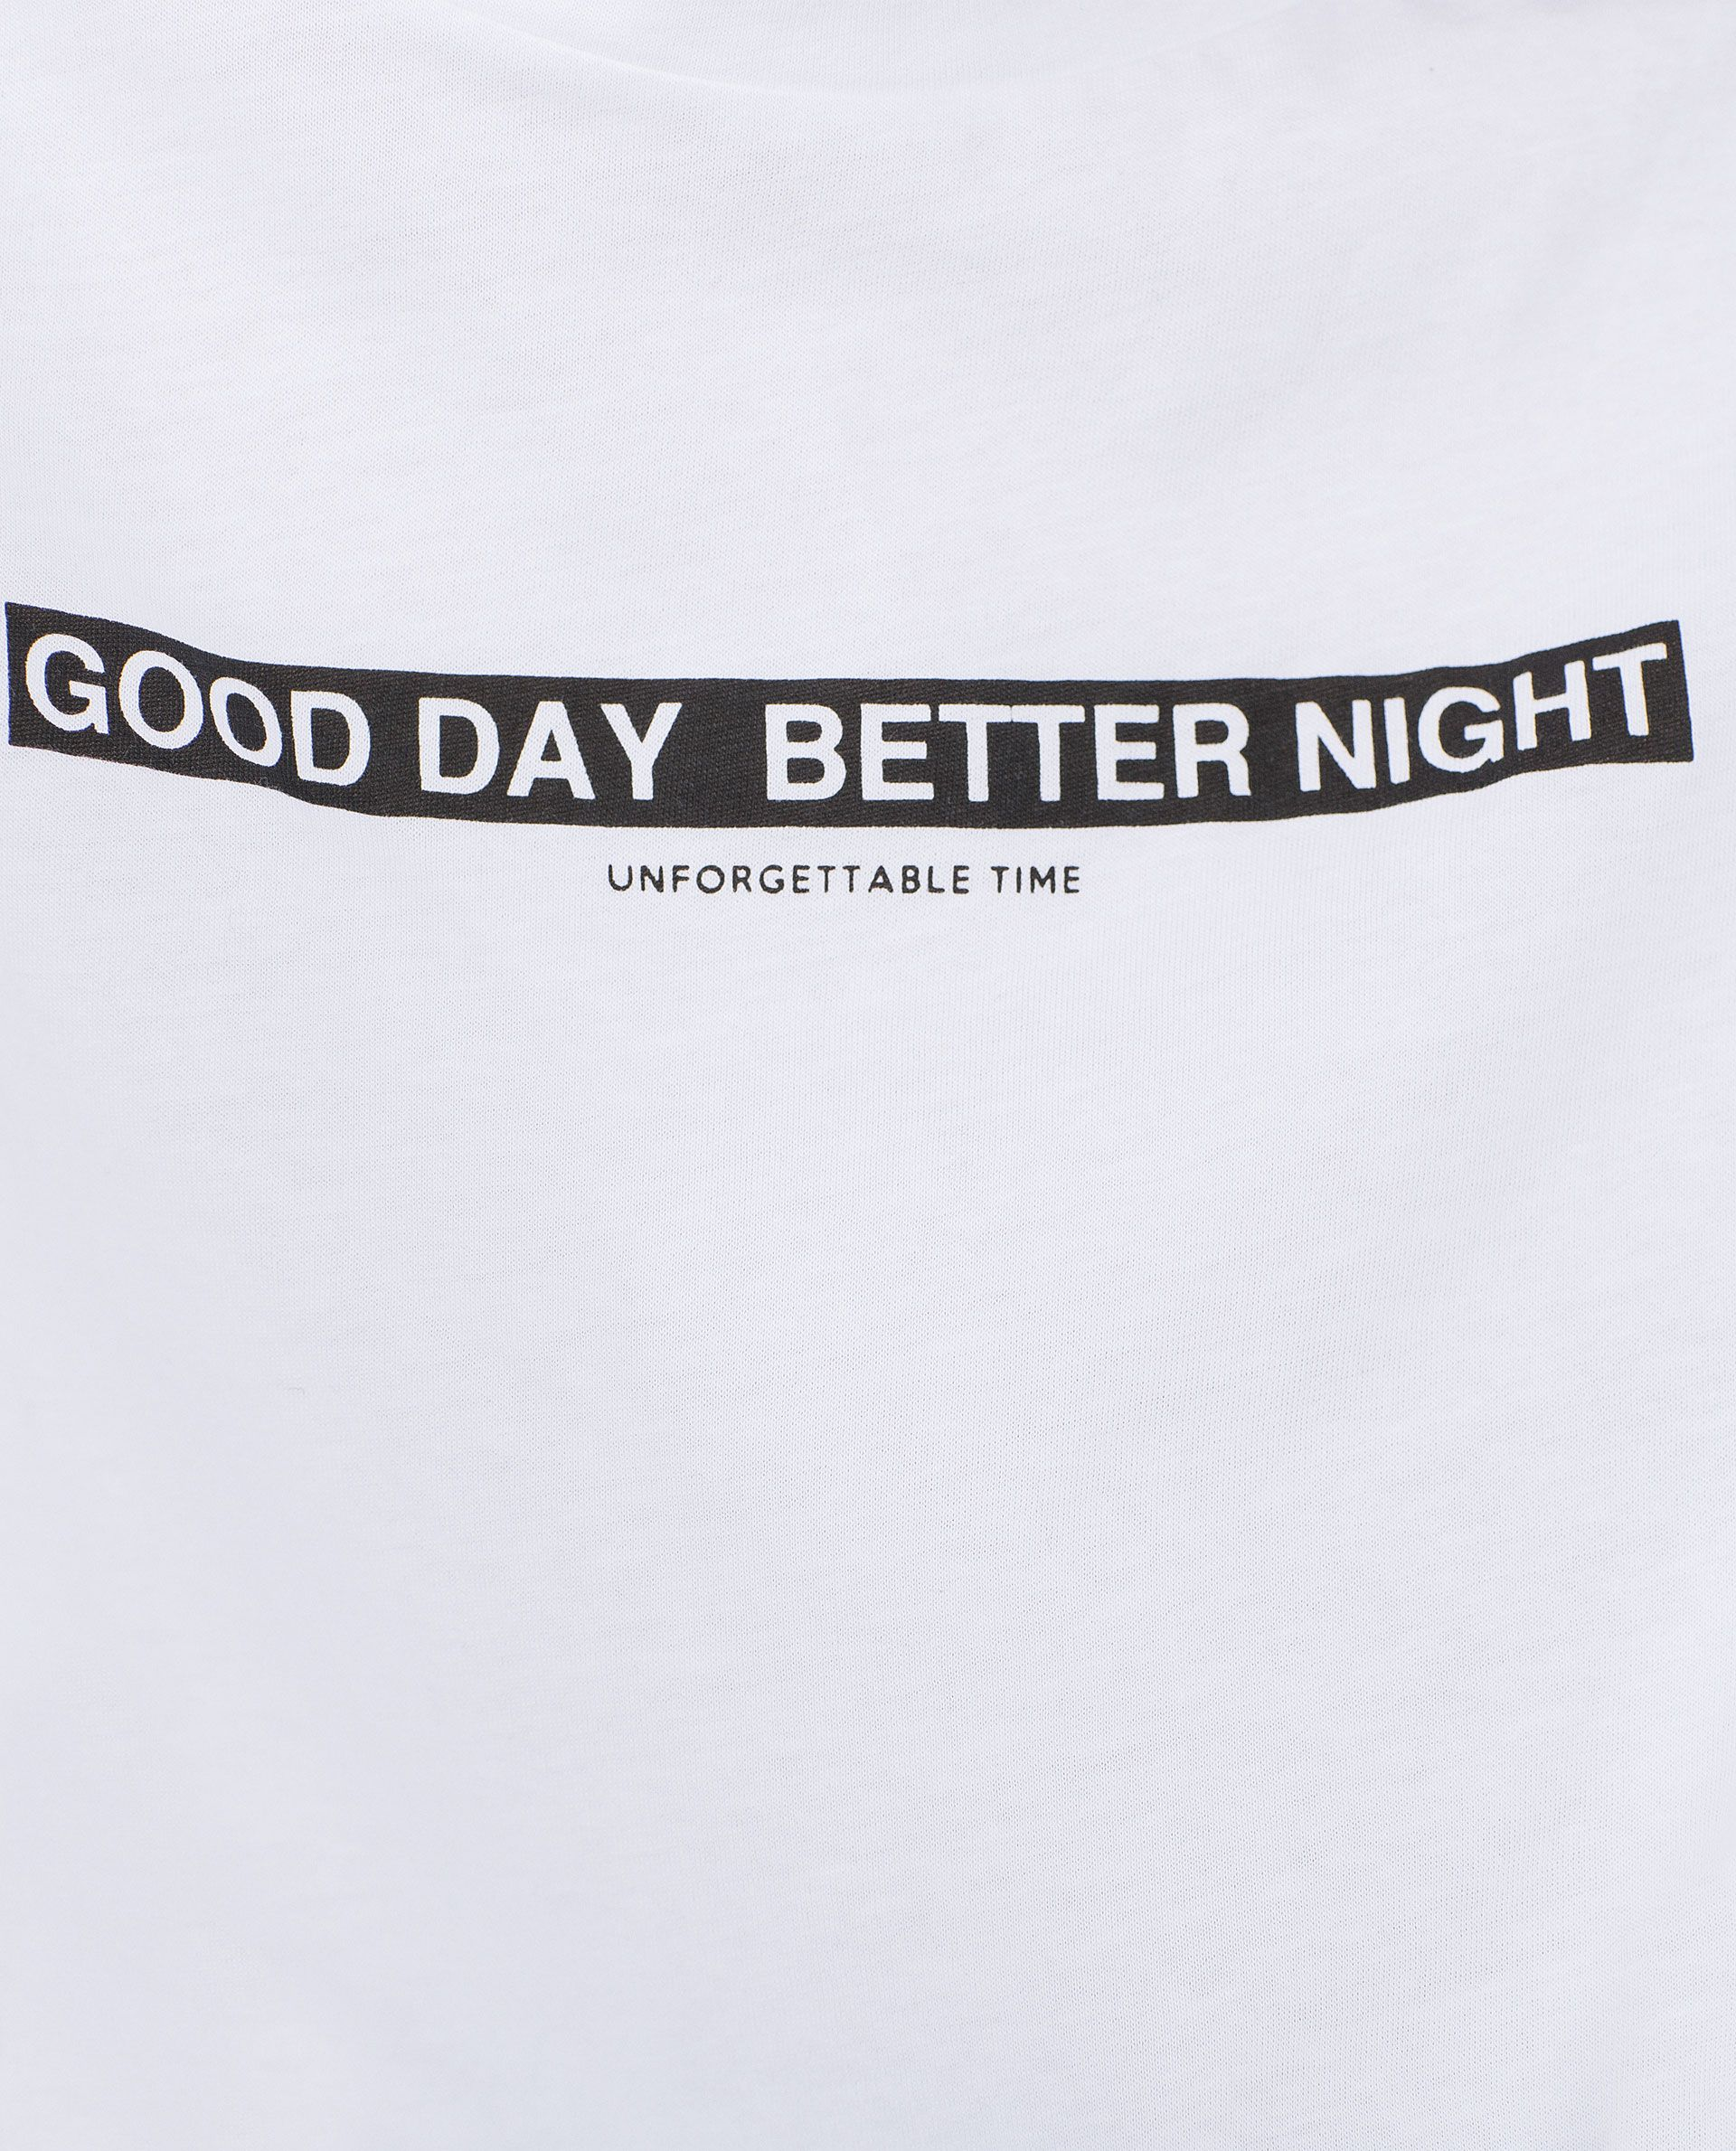 Zara black t shirt india - Oversize Text T Shirt View All T Shirts Woman Zara